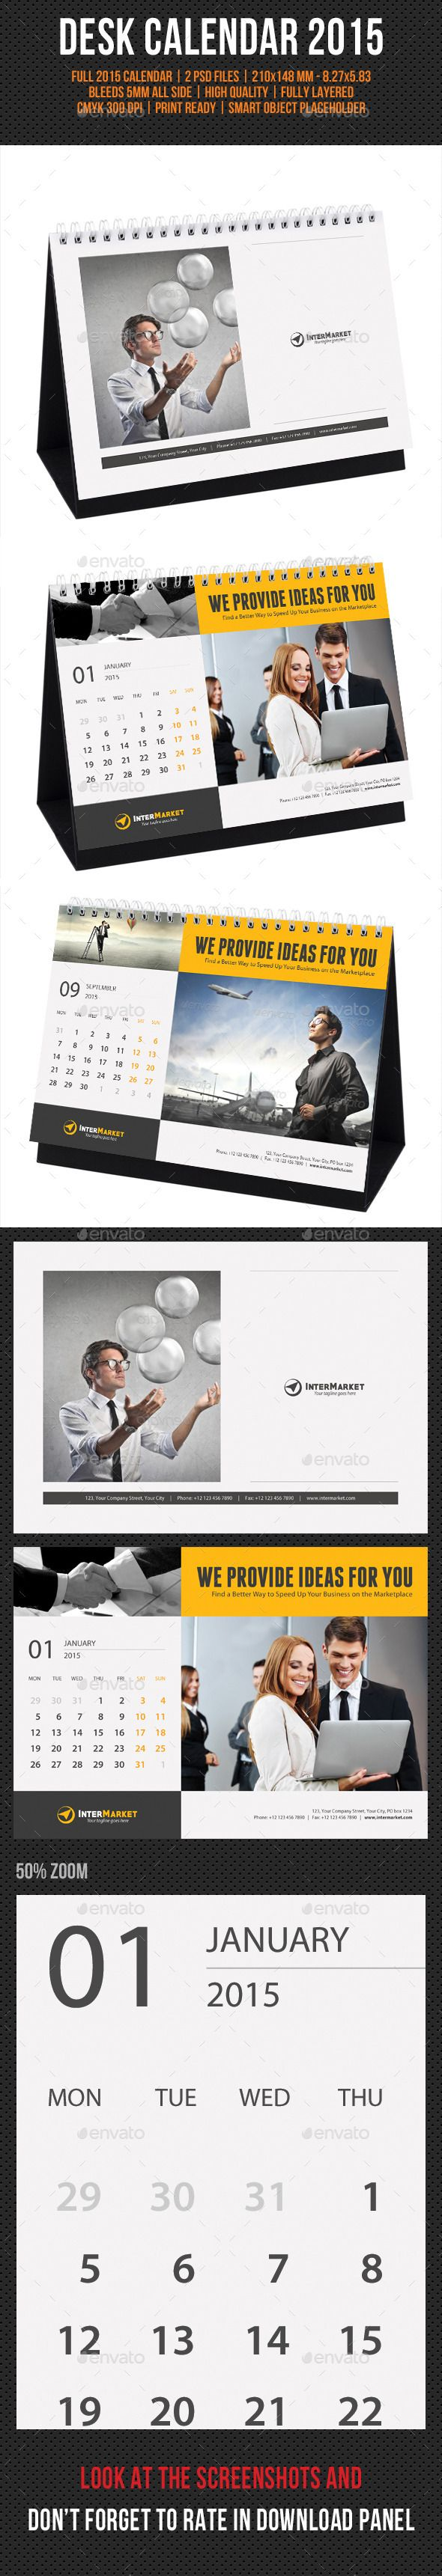 Corporate Desk Calendar 2015 Template | Buy and Download: http://graphicriver.net/item/corporate-desk-calendar-2015/9534311?ref=ksioks